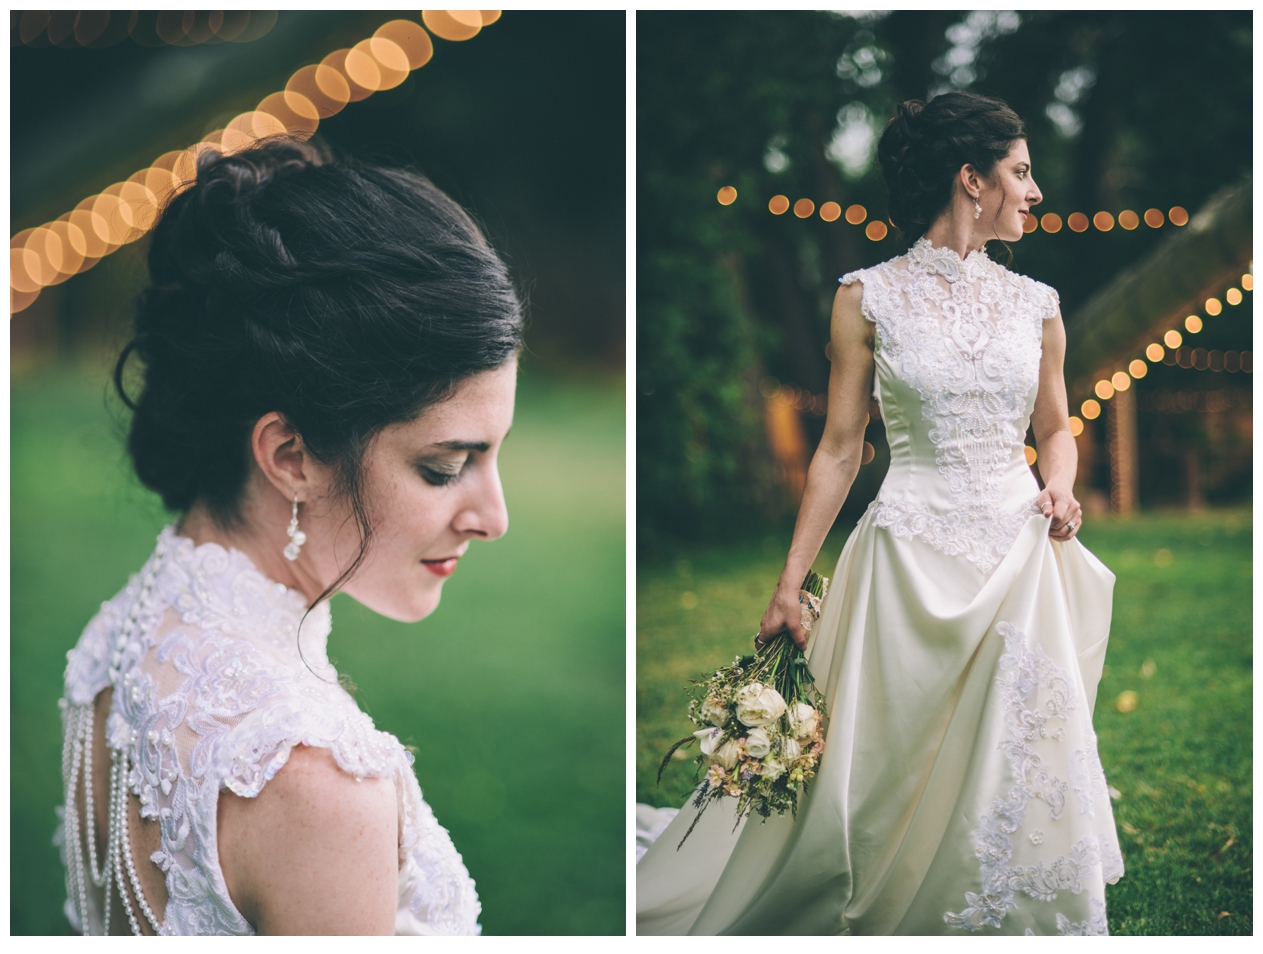 079-AmandaKoppImages-Colorado-Farm-Wedding-Photo.jpg